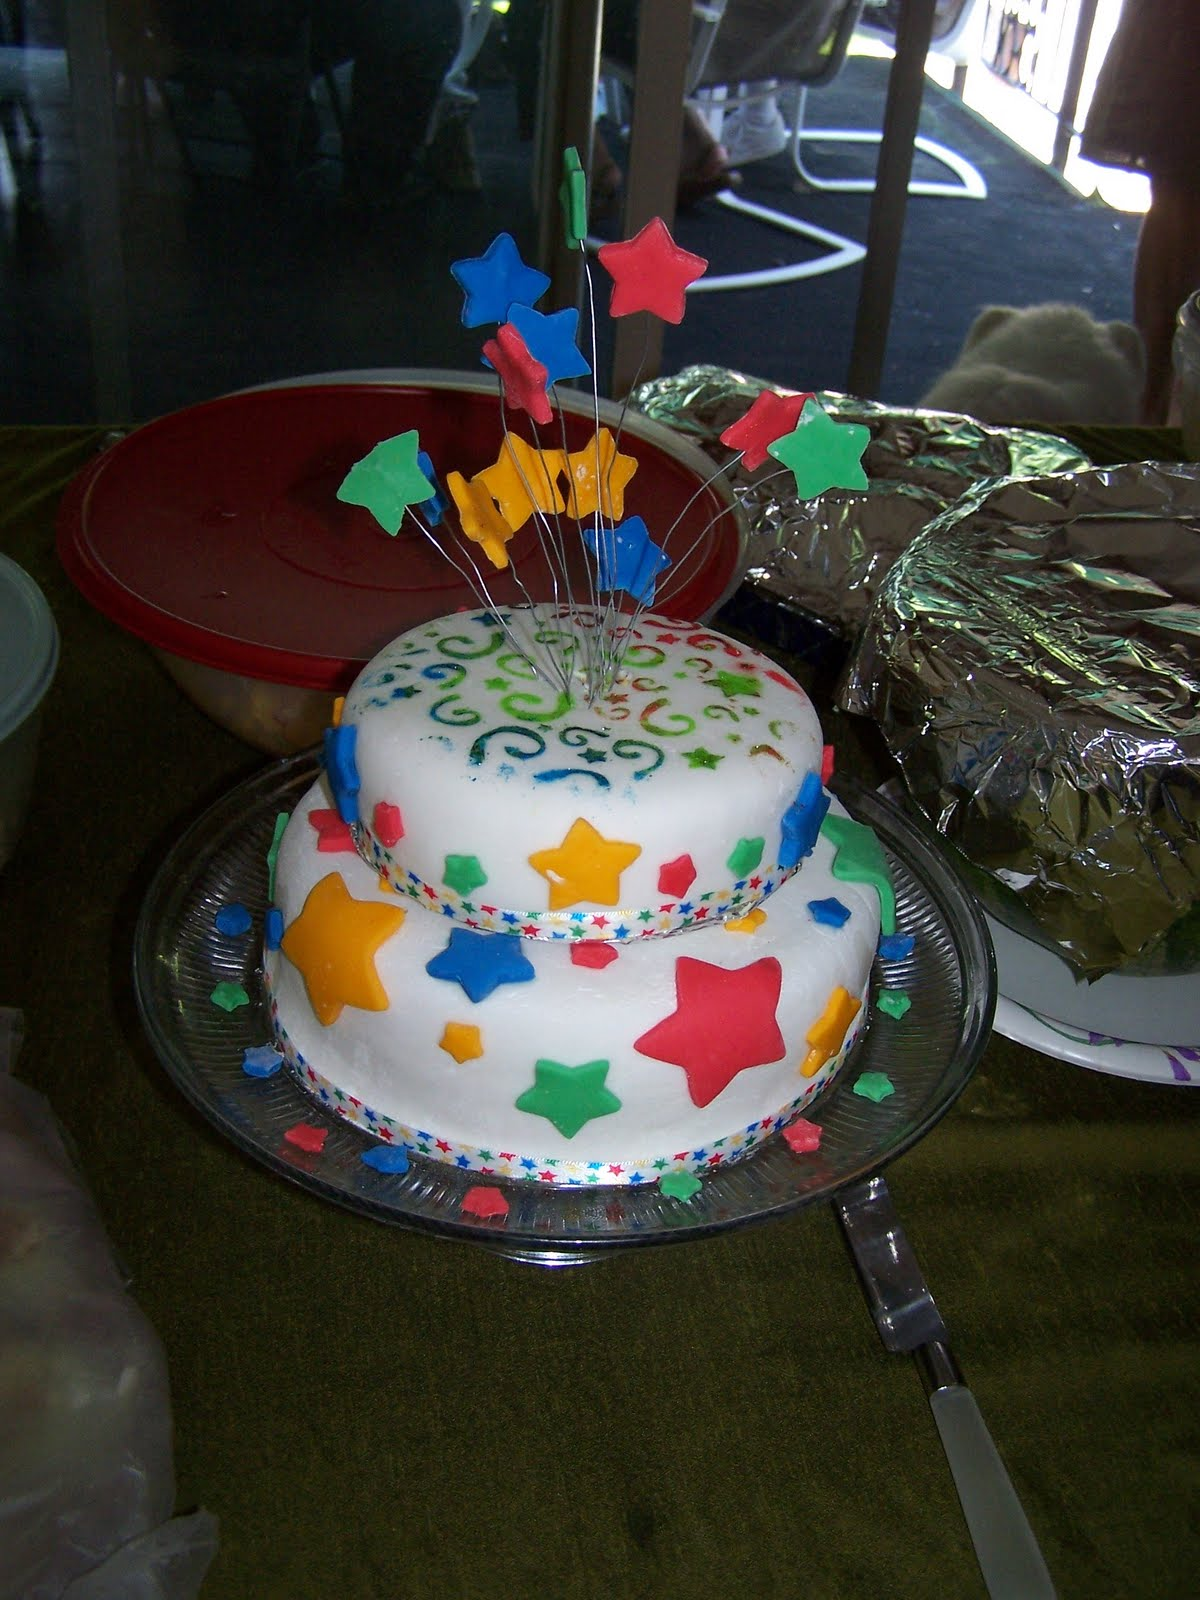 Cake Decoration Ideas For Church : Oiralinde: Decorating Cakes